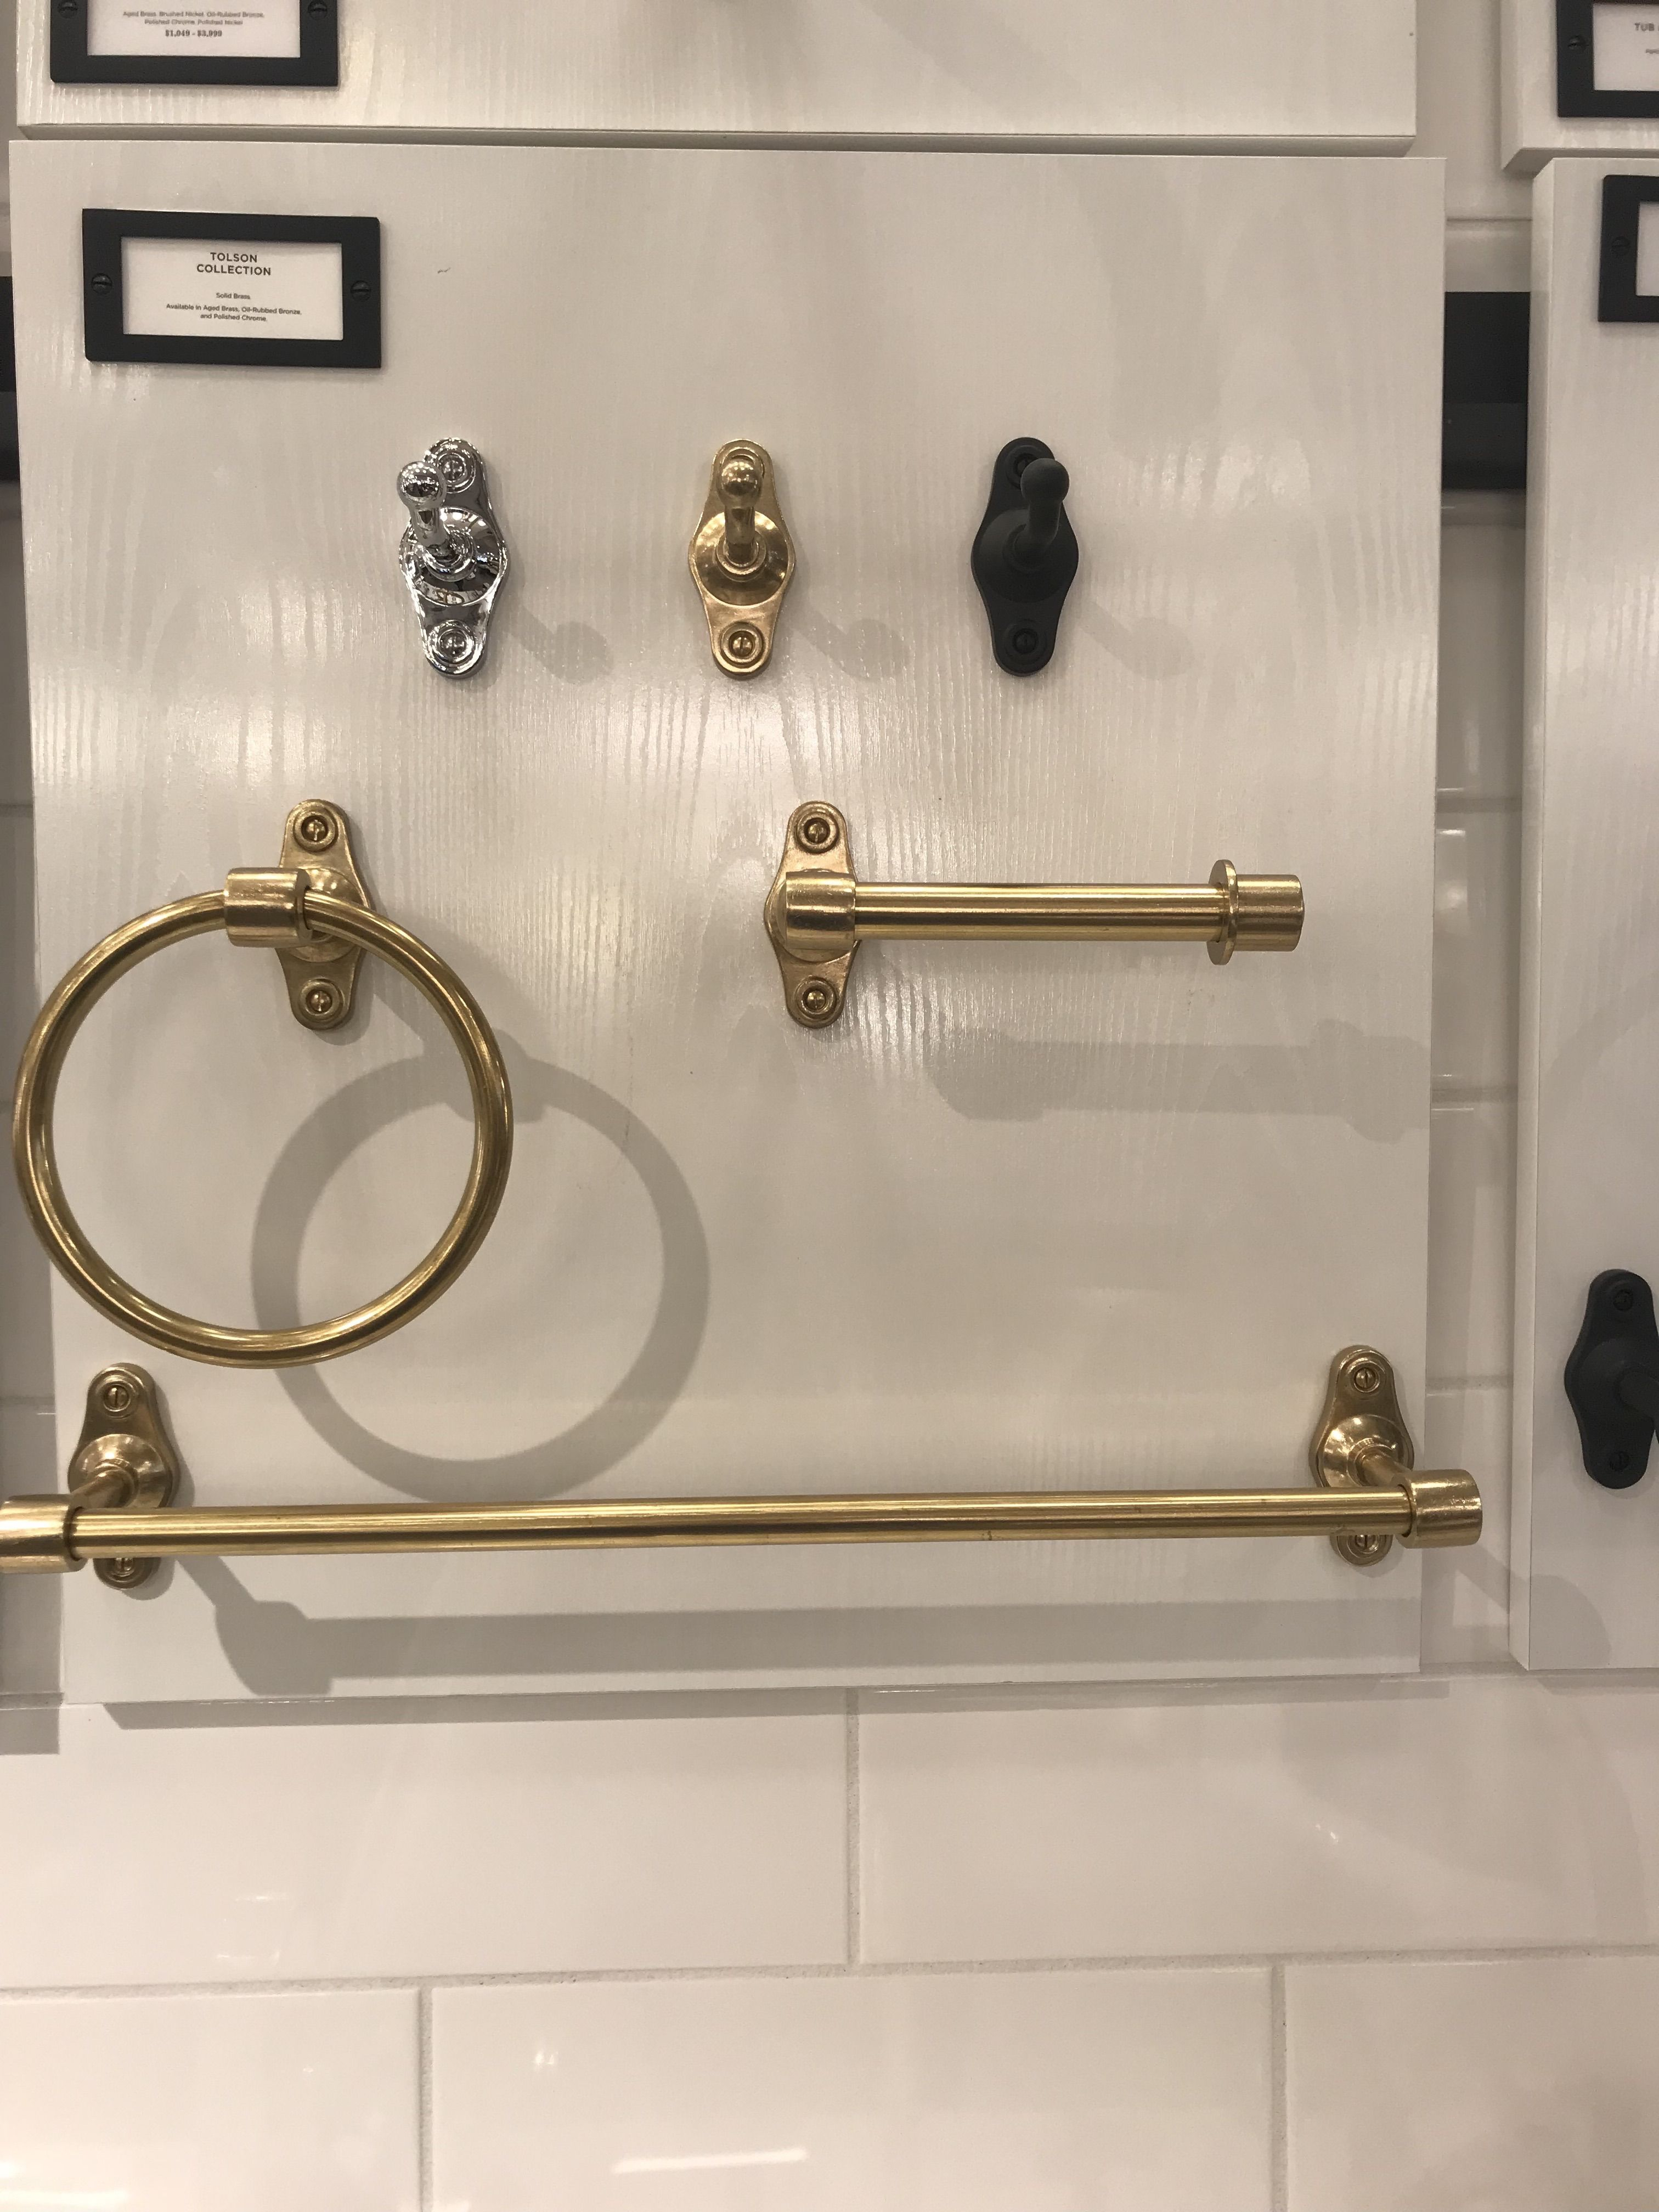 Pin by Joi Kring on Powder bath | Door handles, Decor ...